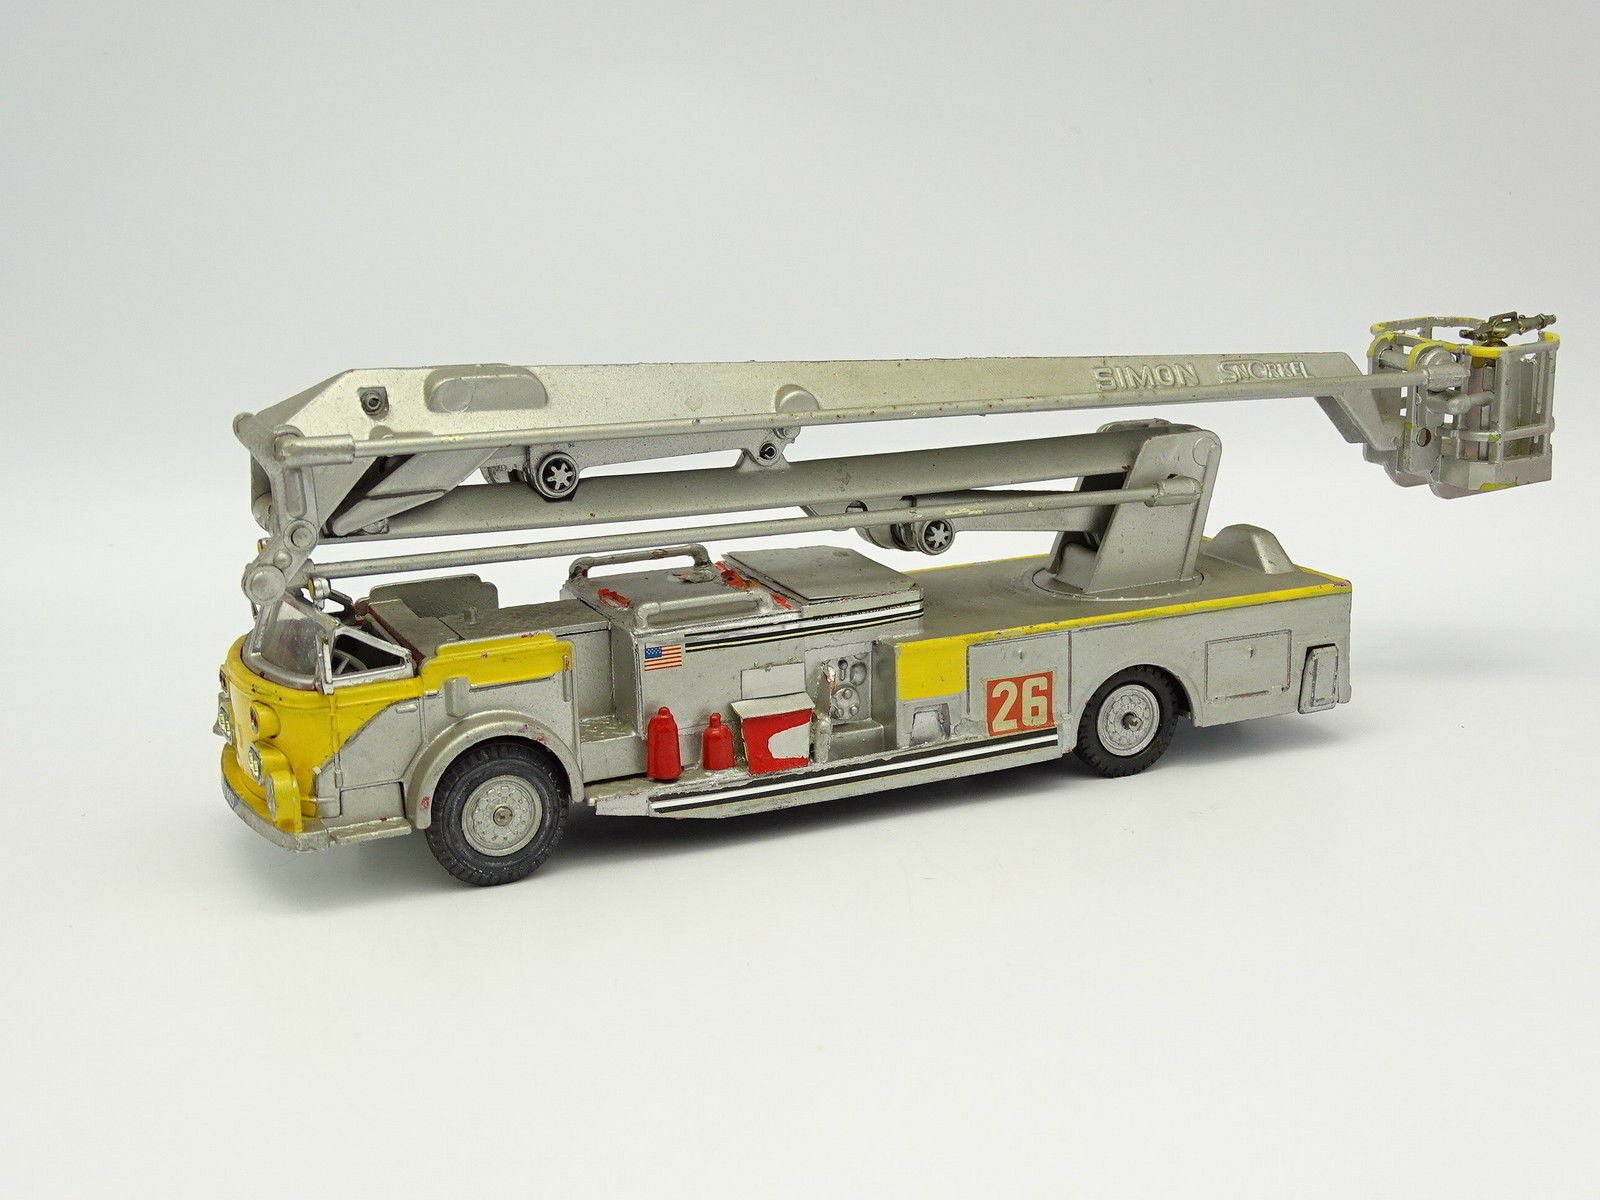 en venta en línea Corgi Modifié 1 43 - Aerial Rescue Tractor + + + Nacelle Simon Snorkel Pompiers gris  punto de venta